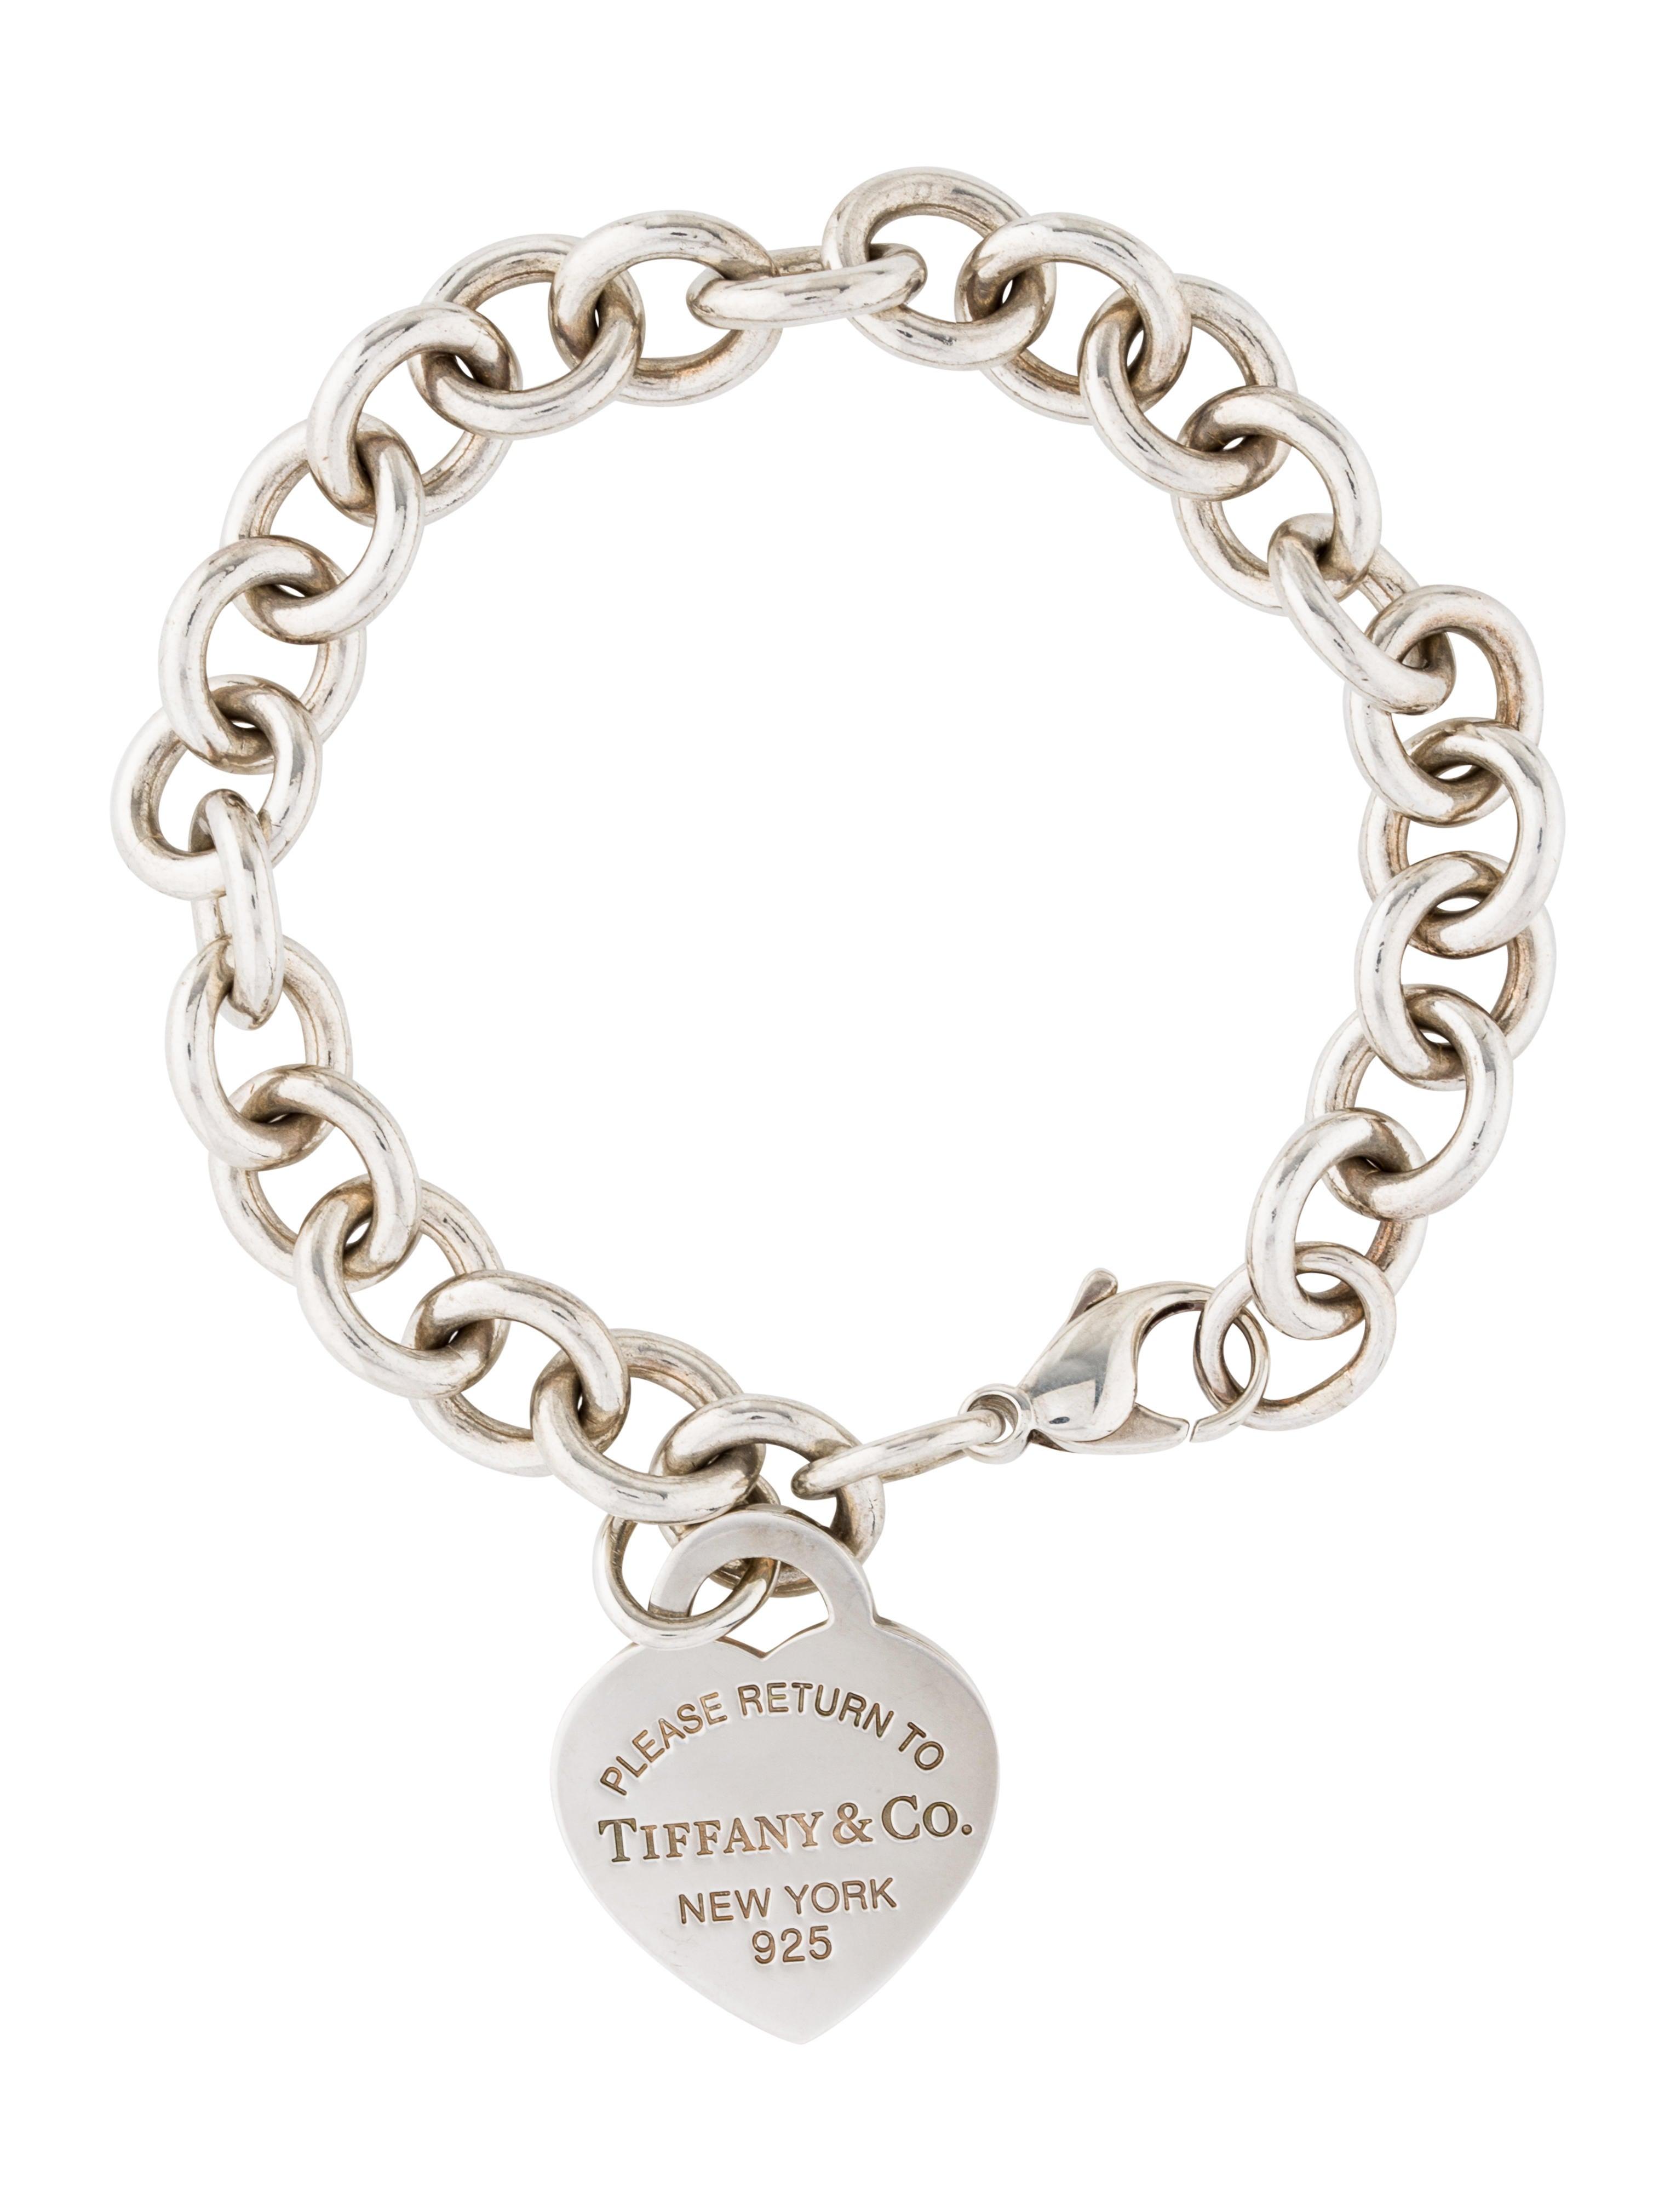 8f710423a8a Tiffany   Co. Return To Tiffany Heart Tag Charm Bracelet - Bracelets ...